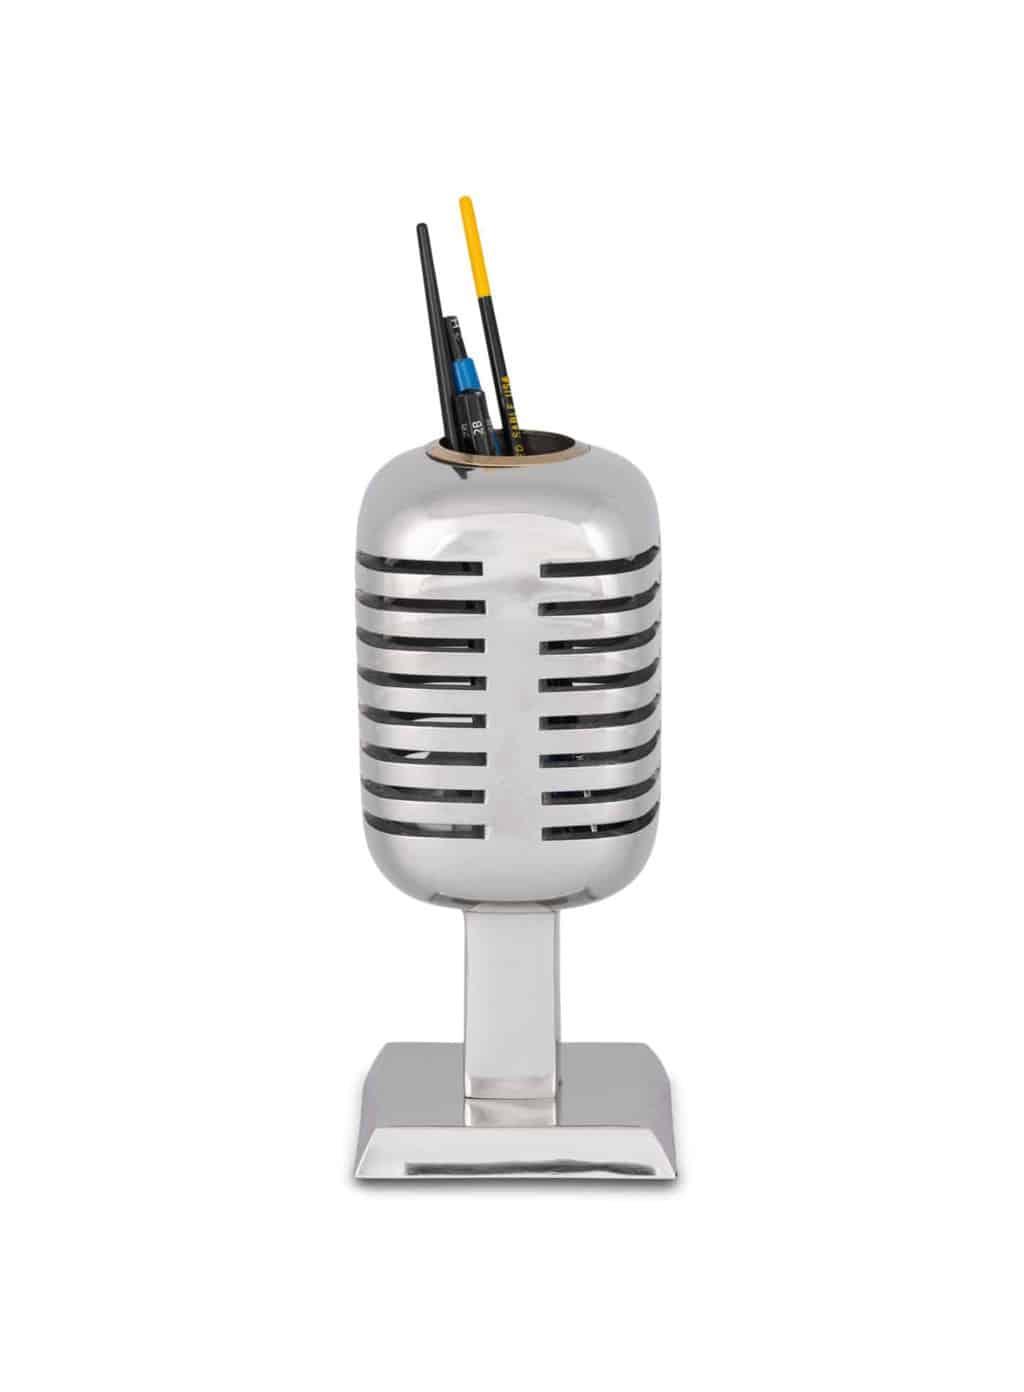 RADIO CITY MICROPHONE PENCIL HOLDER